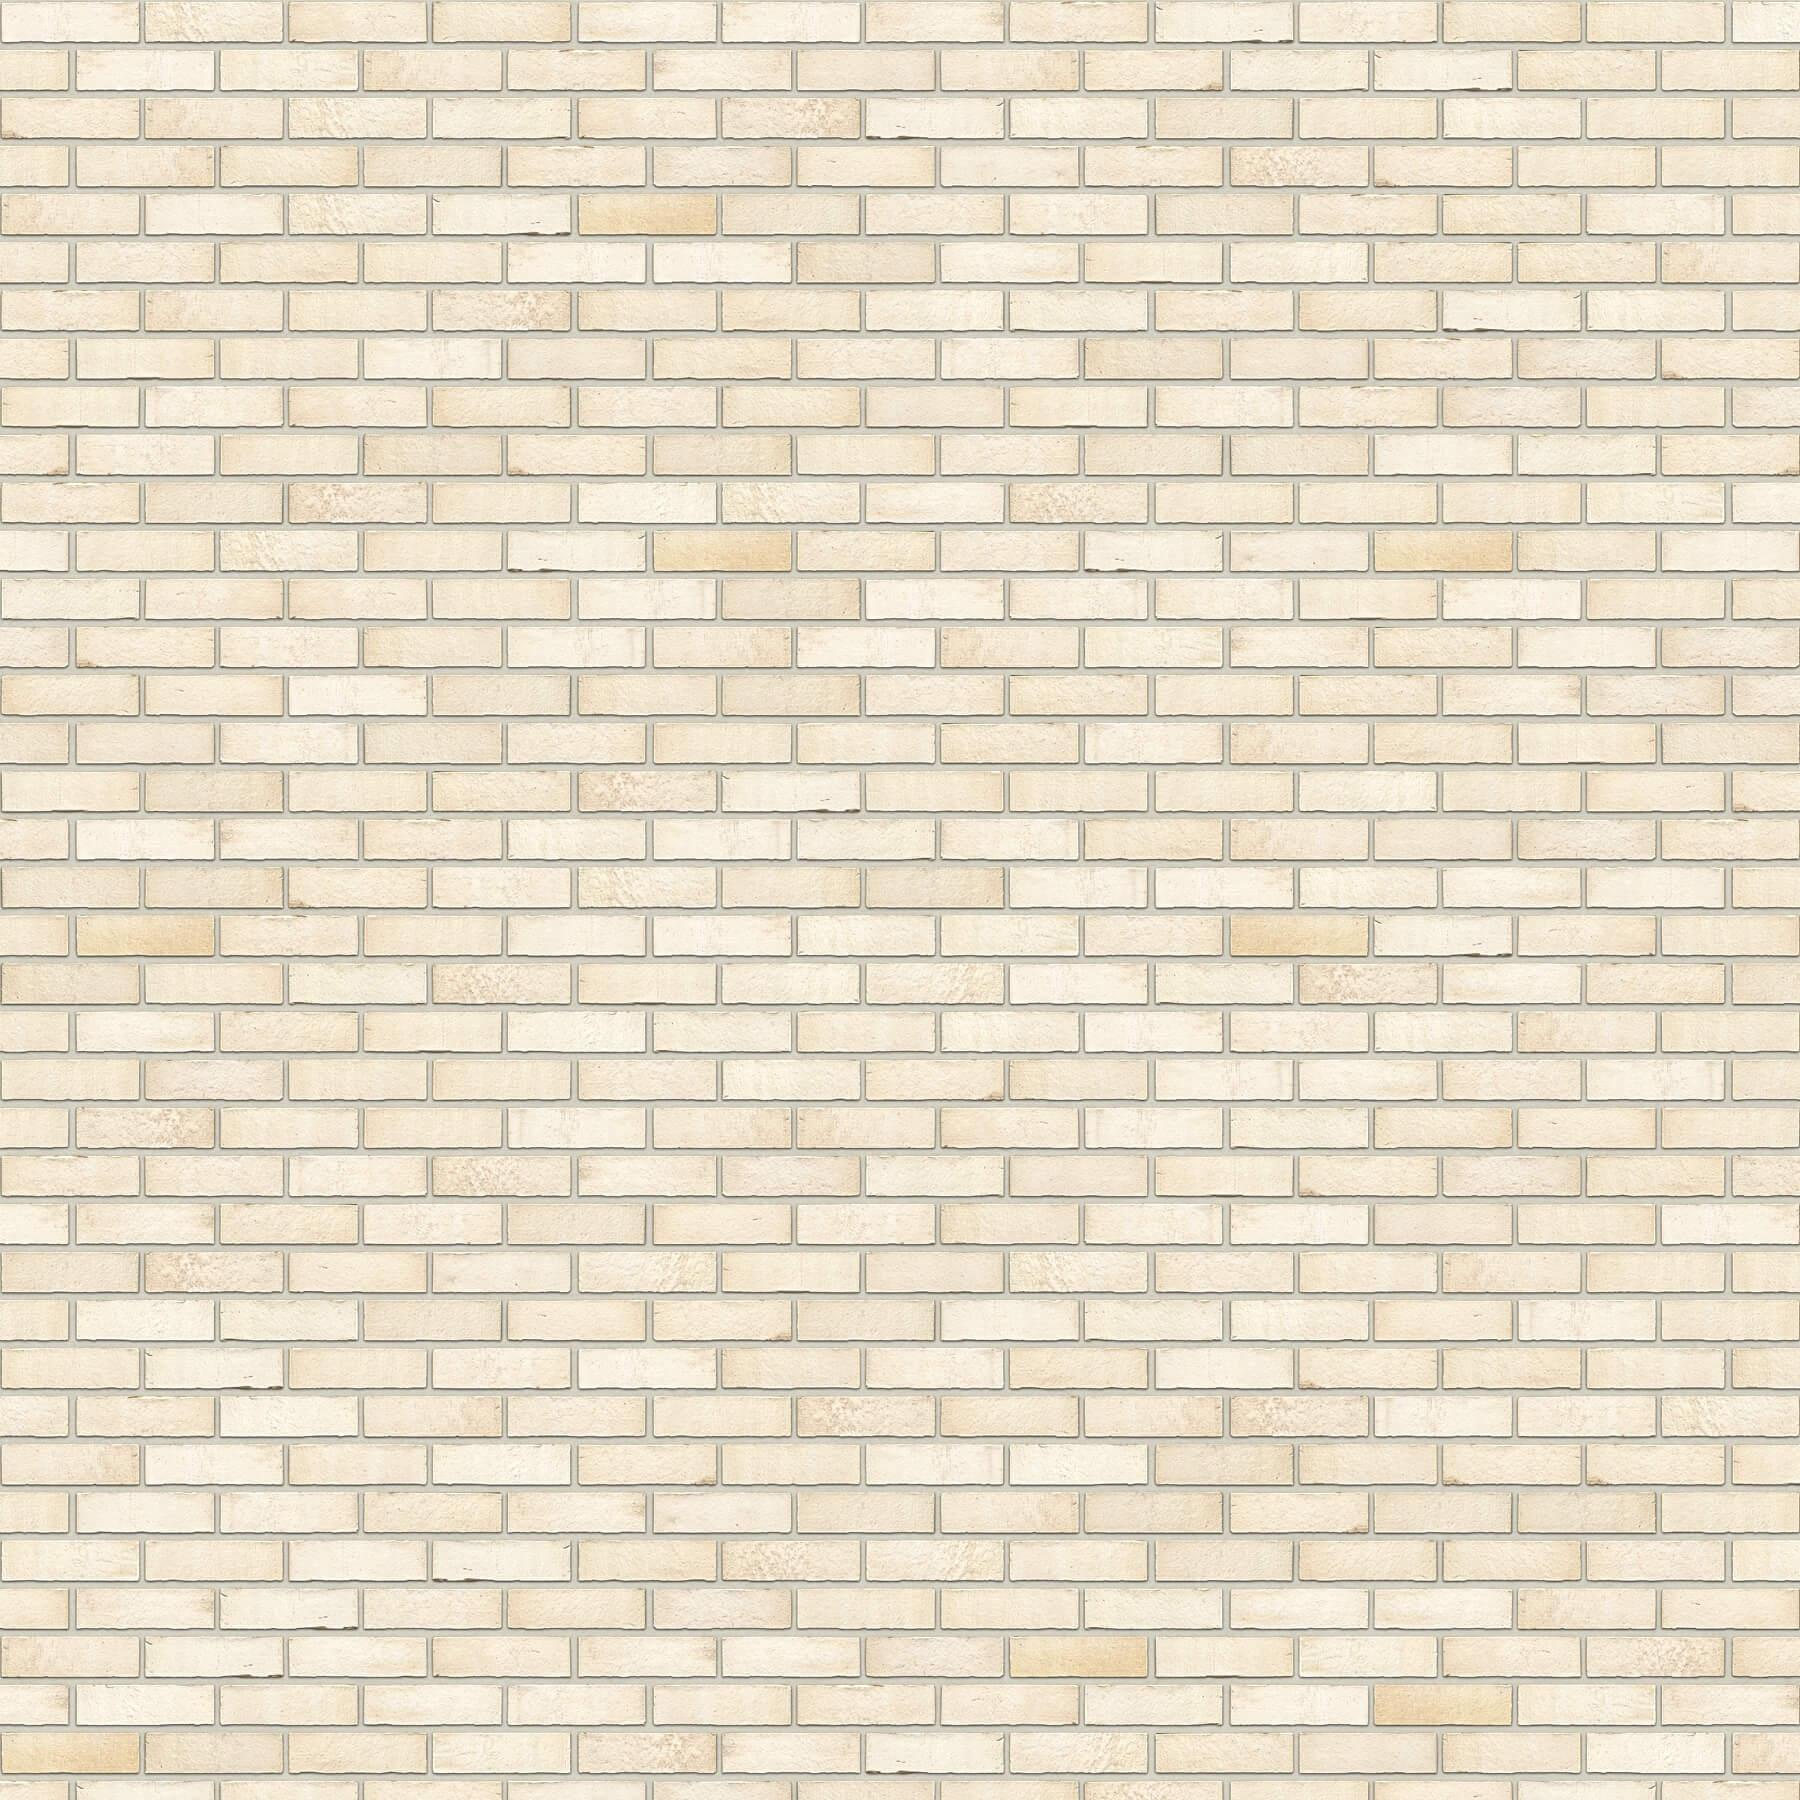 Puna-cigla-FeldHaus-Klinker-brick-house-beograd-nf-k-911-Bela Fuga